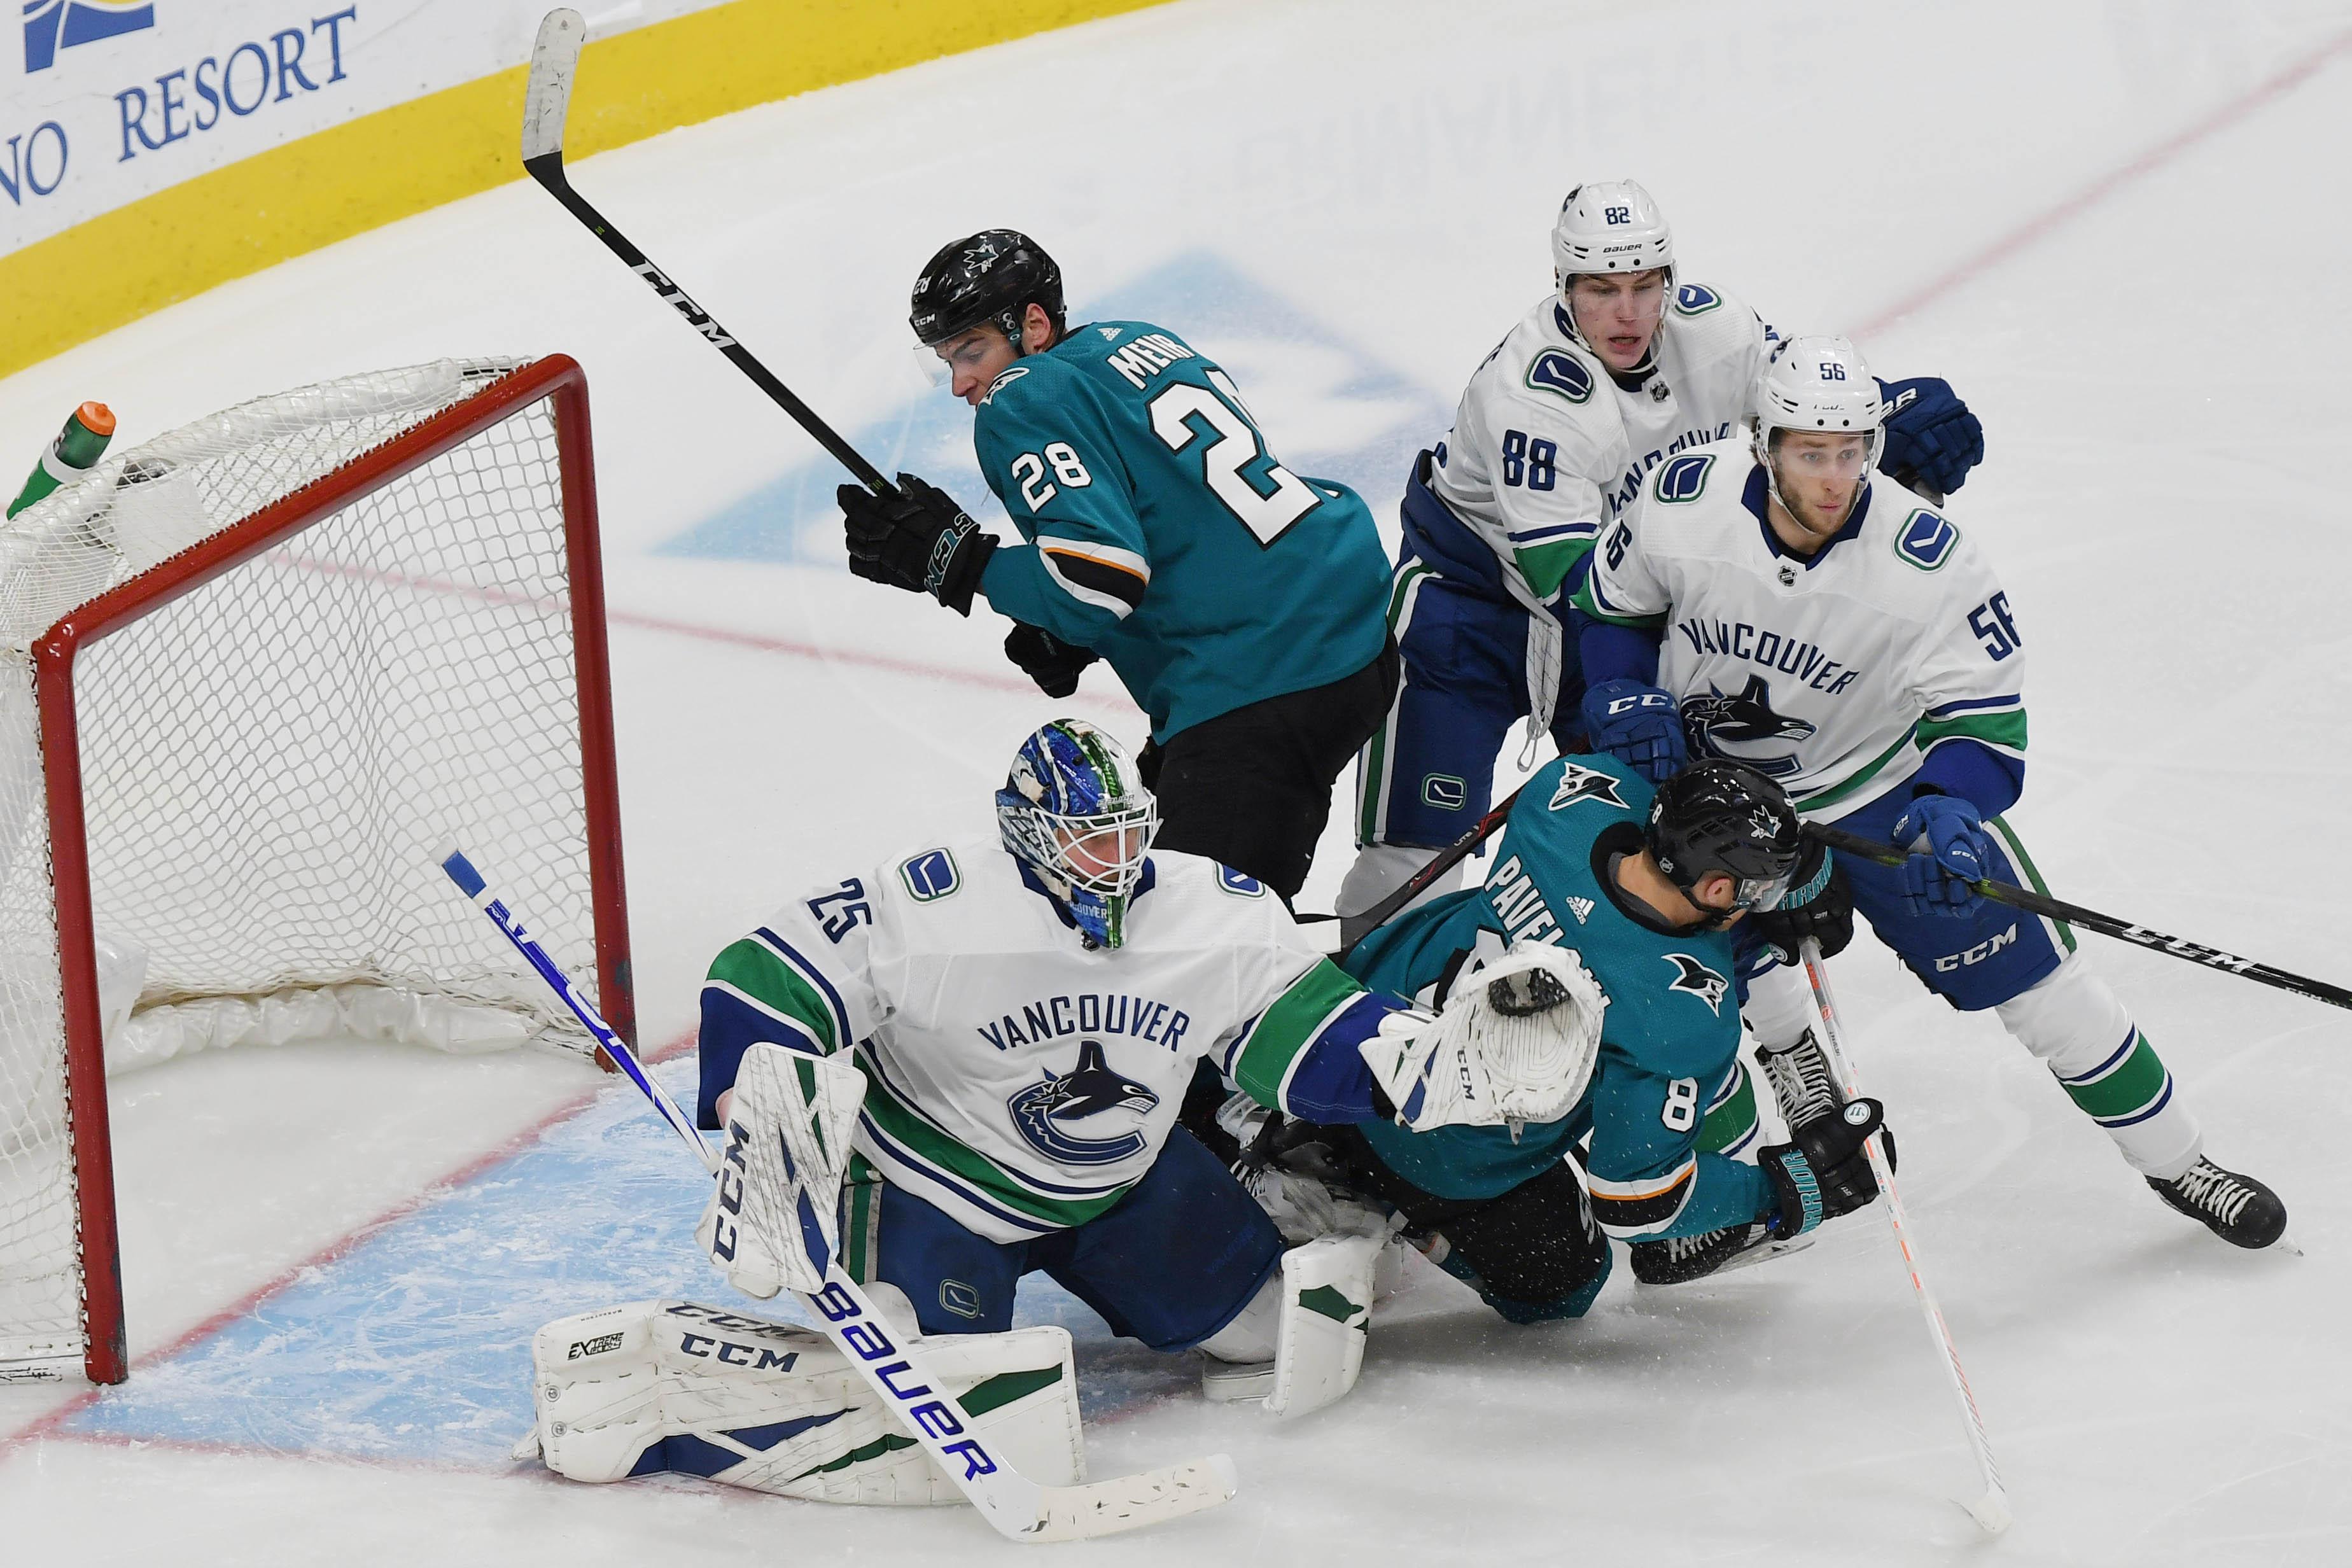 Feb 16, 2019; San Jose, CA, USA; San Jose Sharks center Joe Pavelski (8) collides with Vancouver Canucks goaltender Jacob Markstrom (25) in the second period of their game at SAP Center at San Jose. Mandatory Credit: Robert Edwards